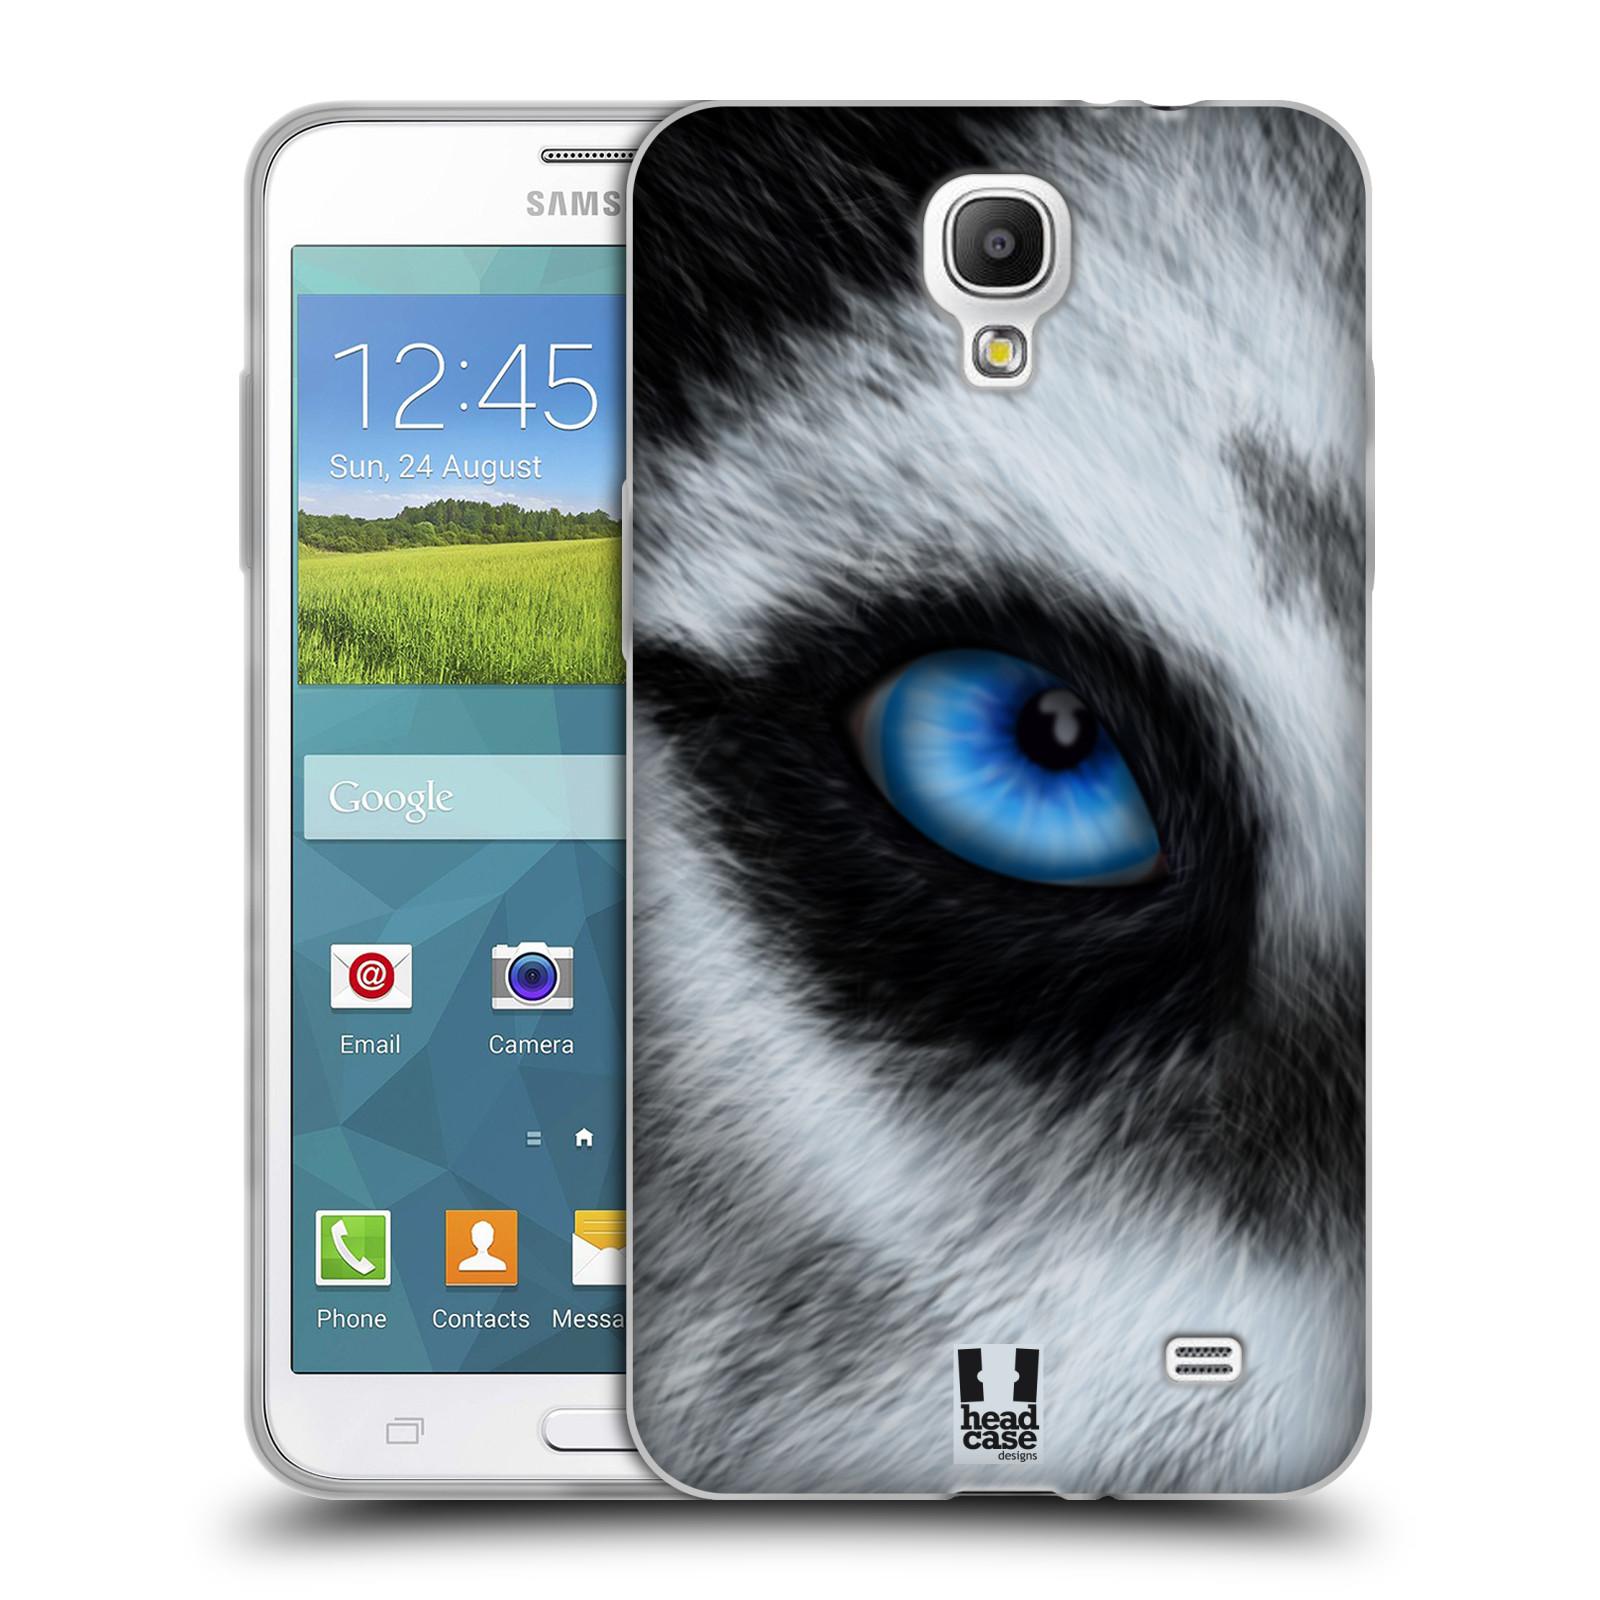 HEAD CASE silikonový obal na mobil Samsung Galaxy Mega 2 vzor pohled zvířete oko pes husky